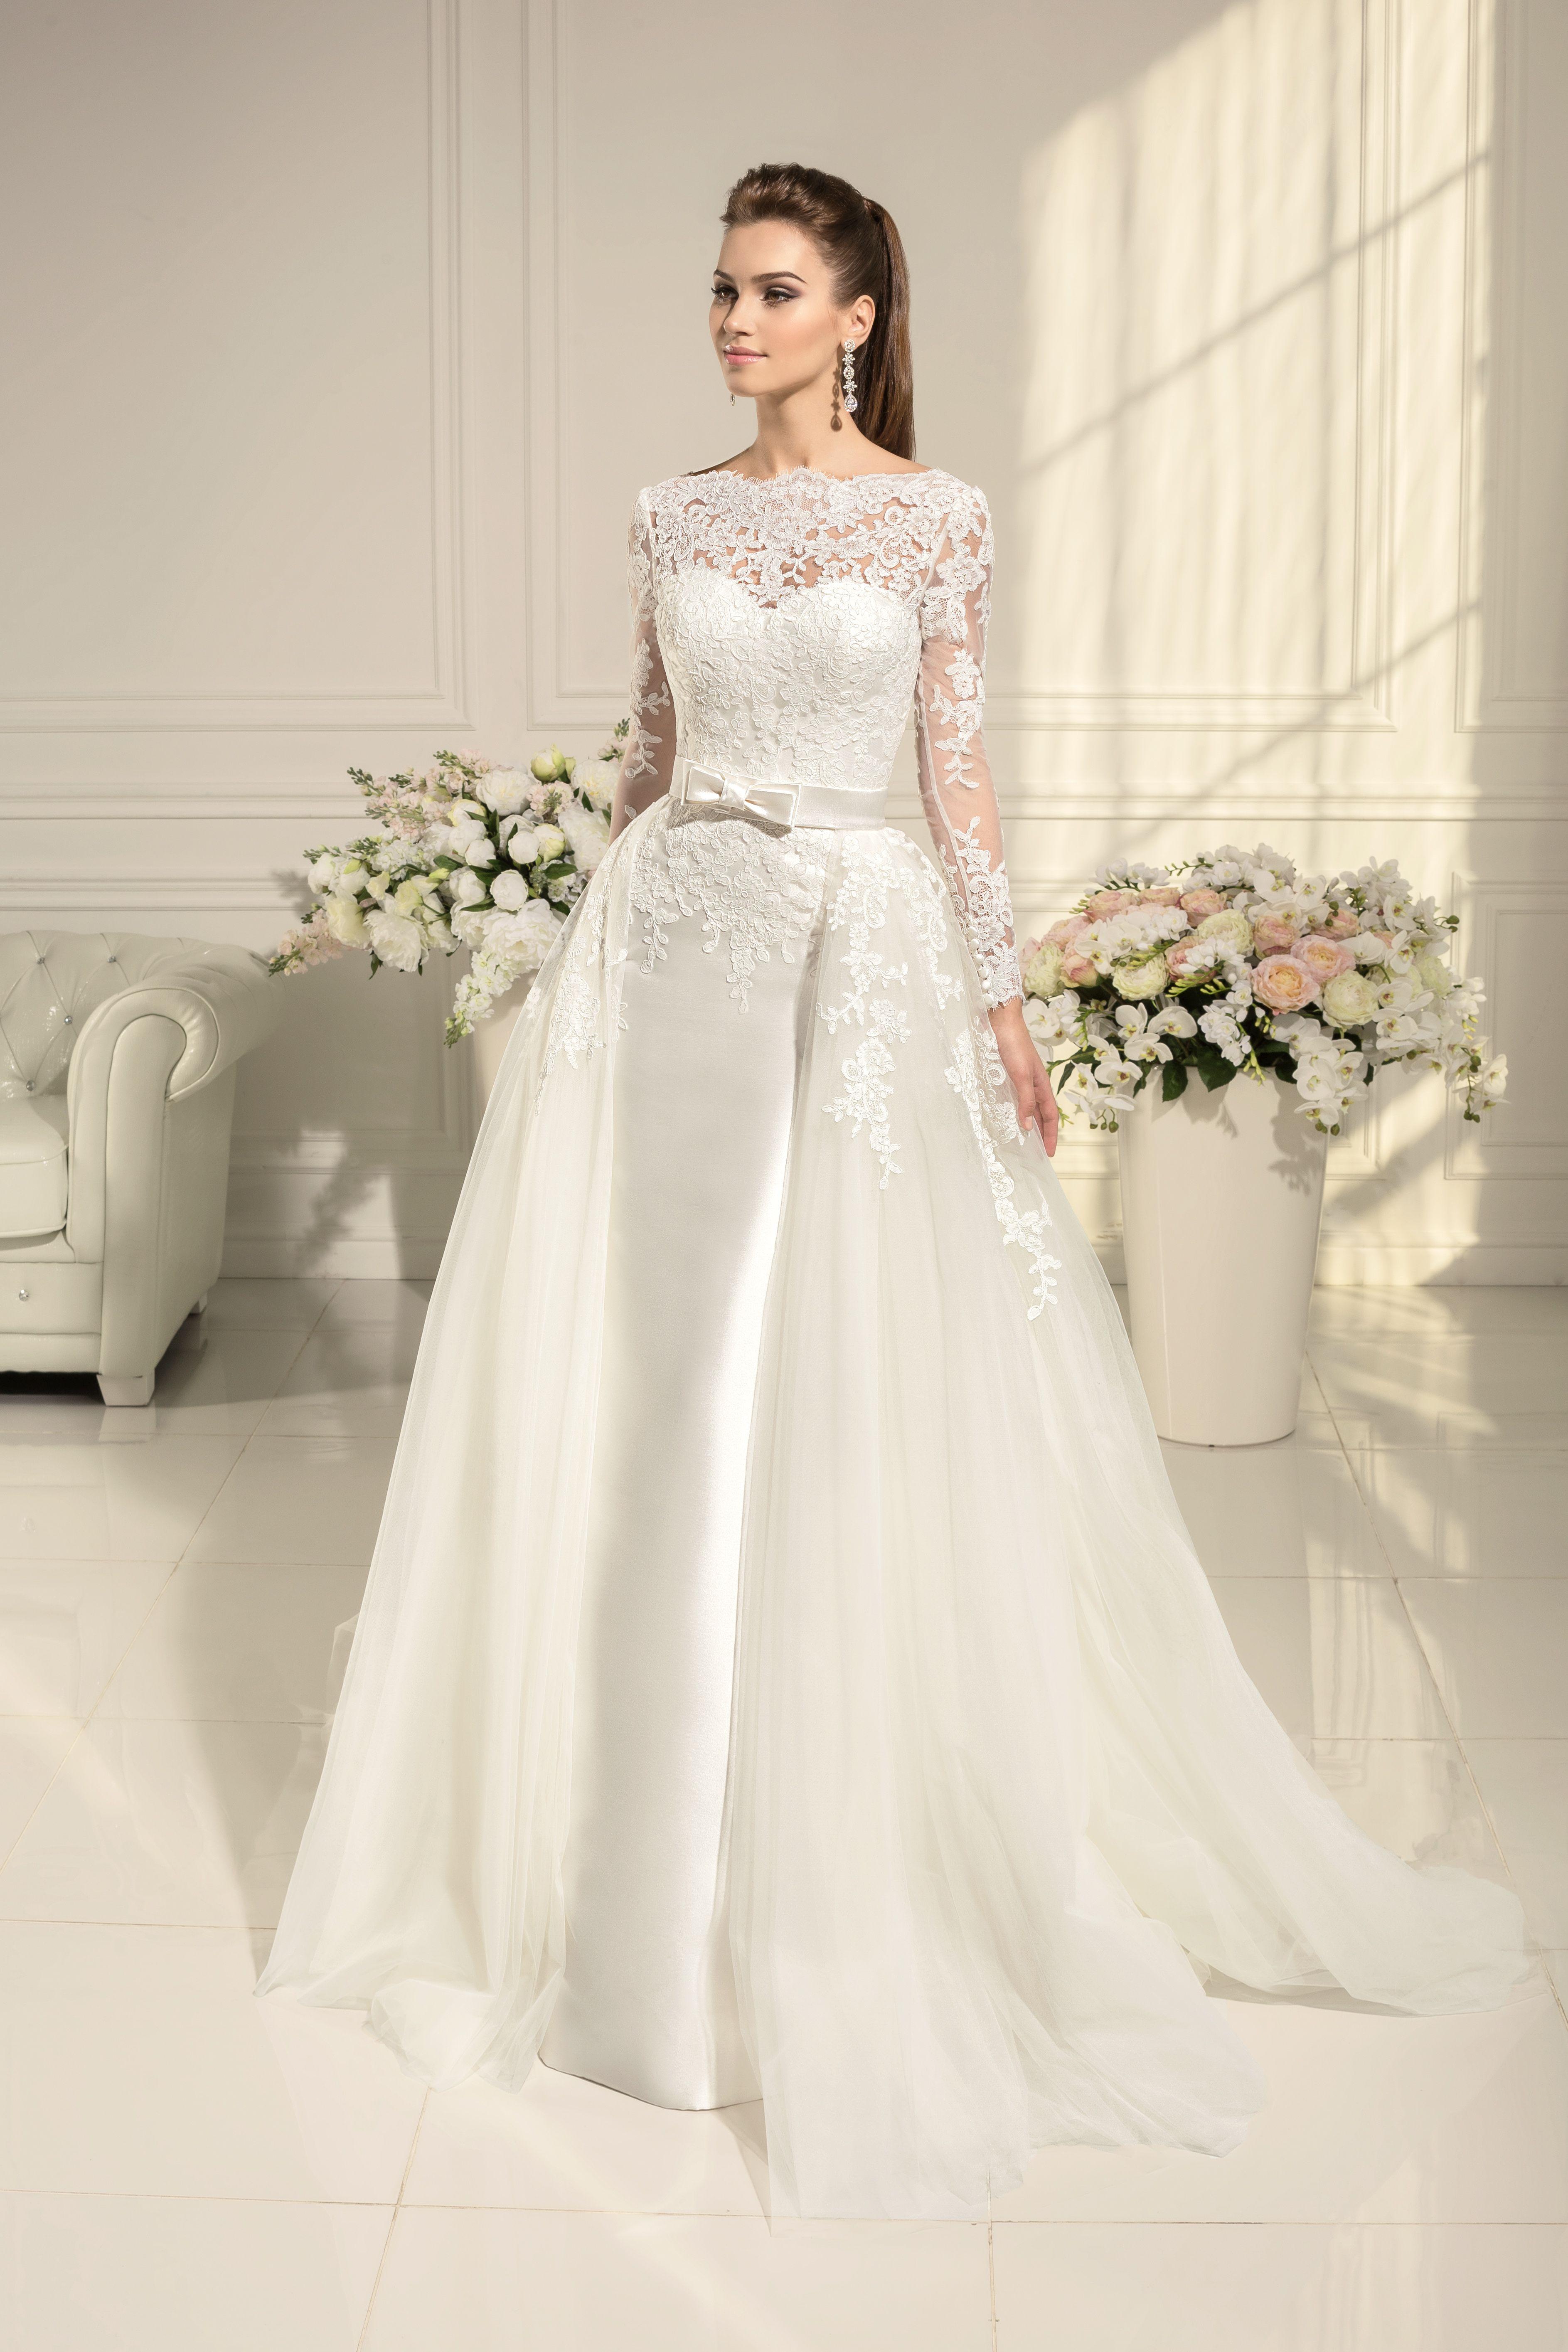 Nora naviano свадебные платья